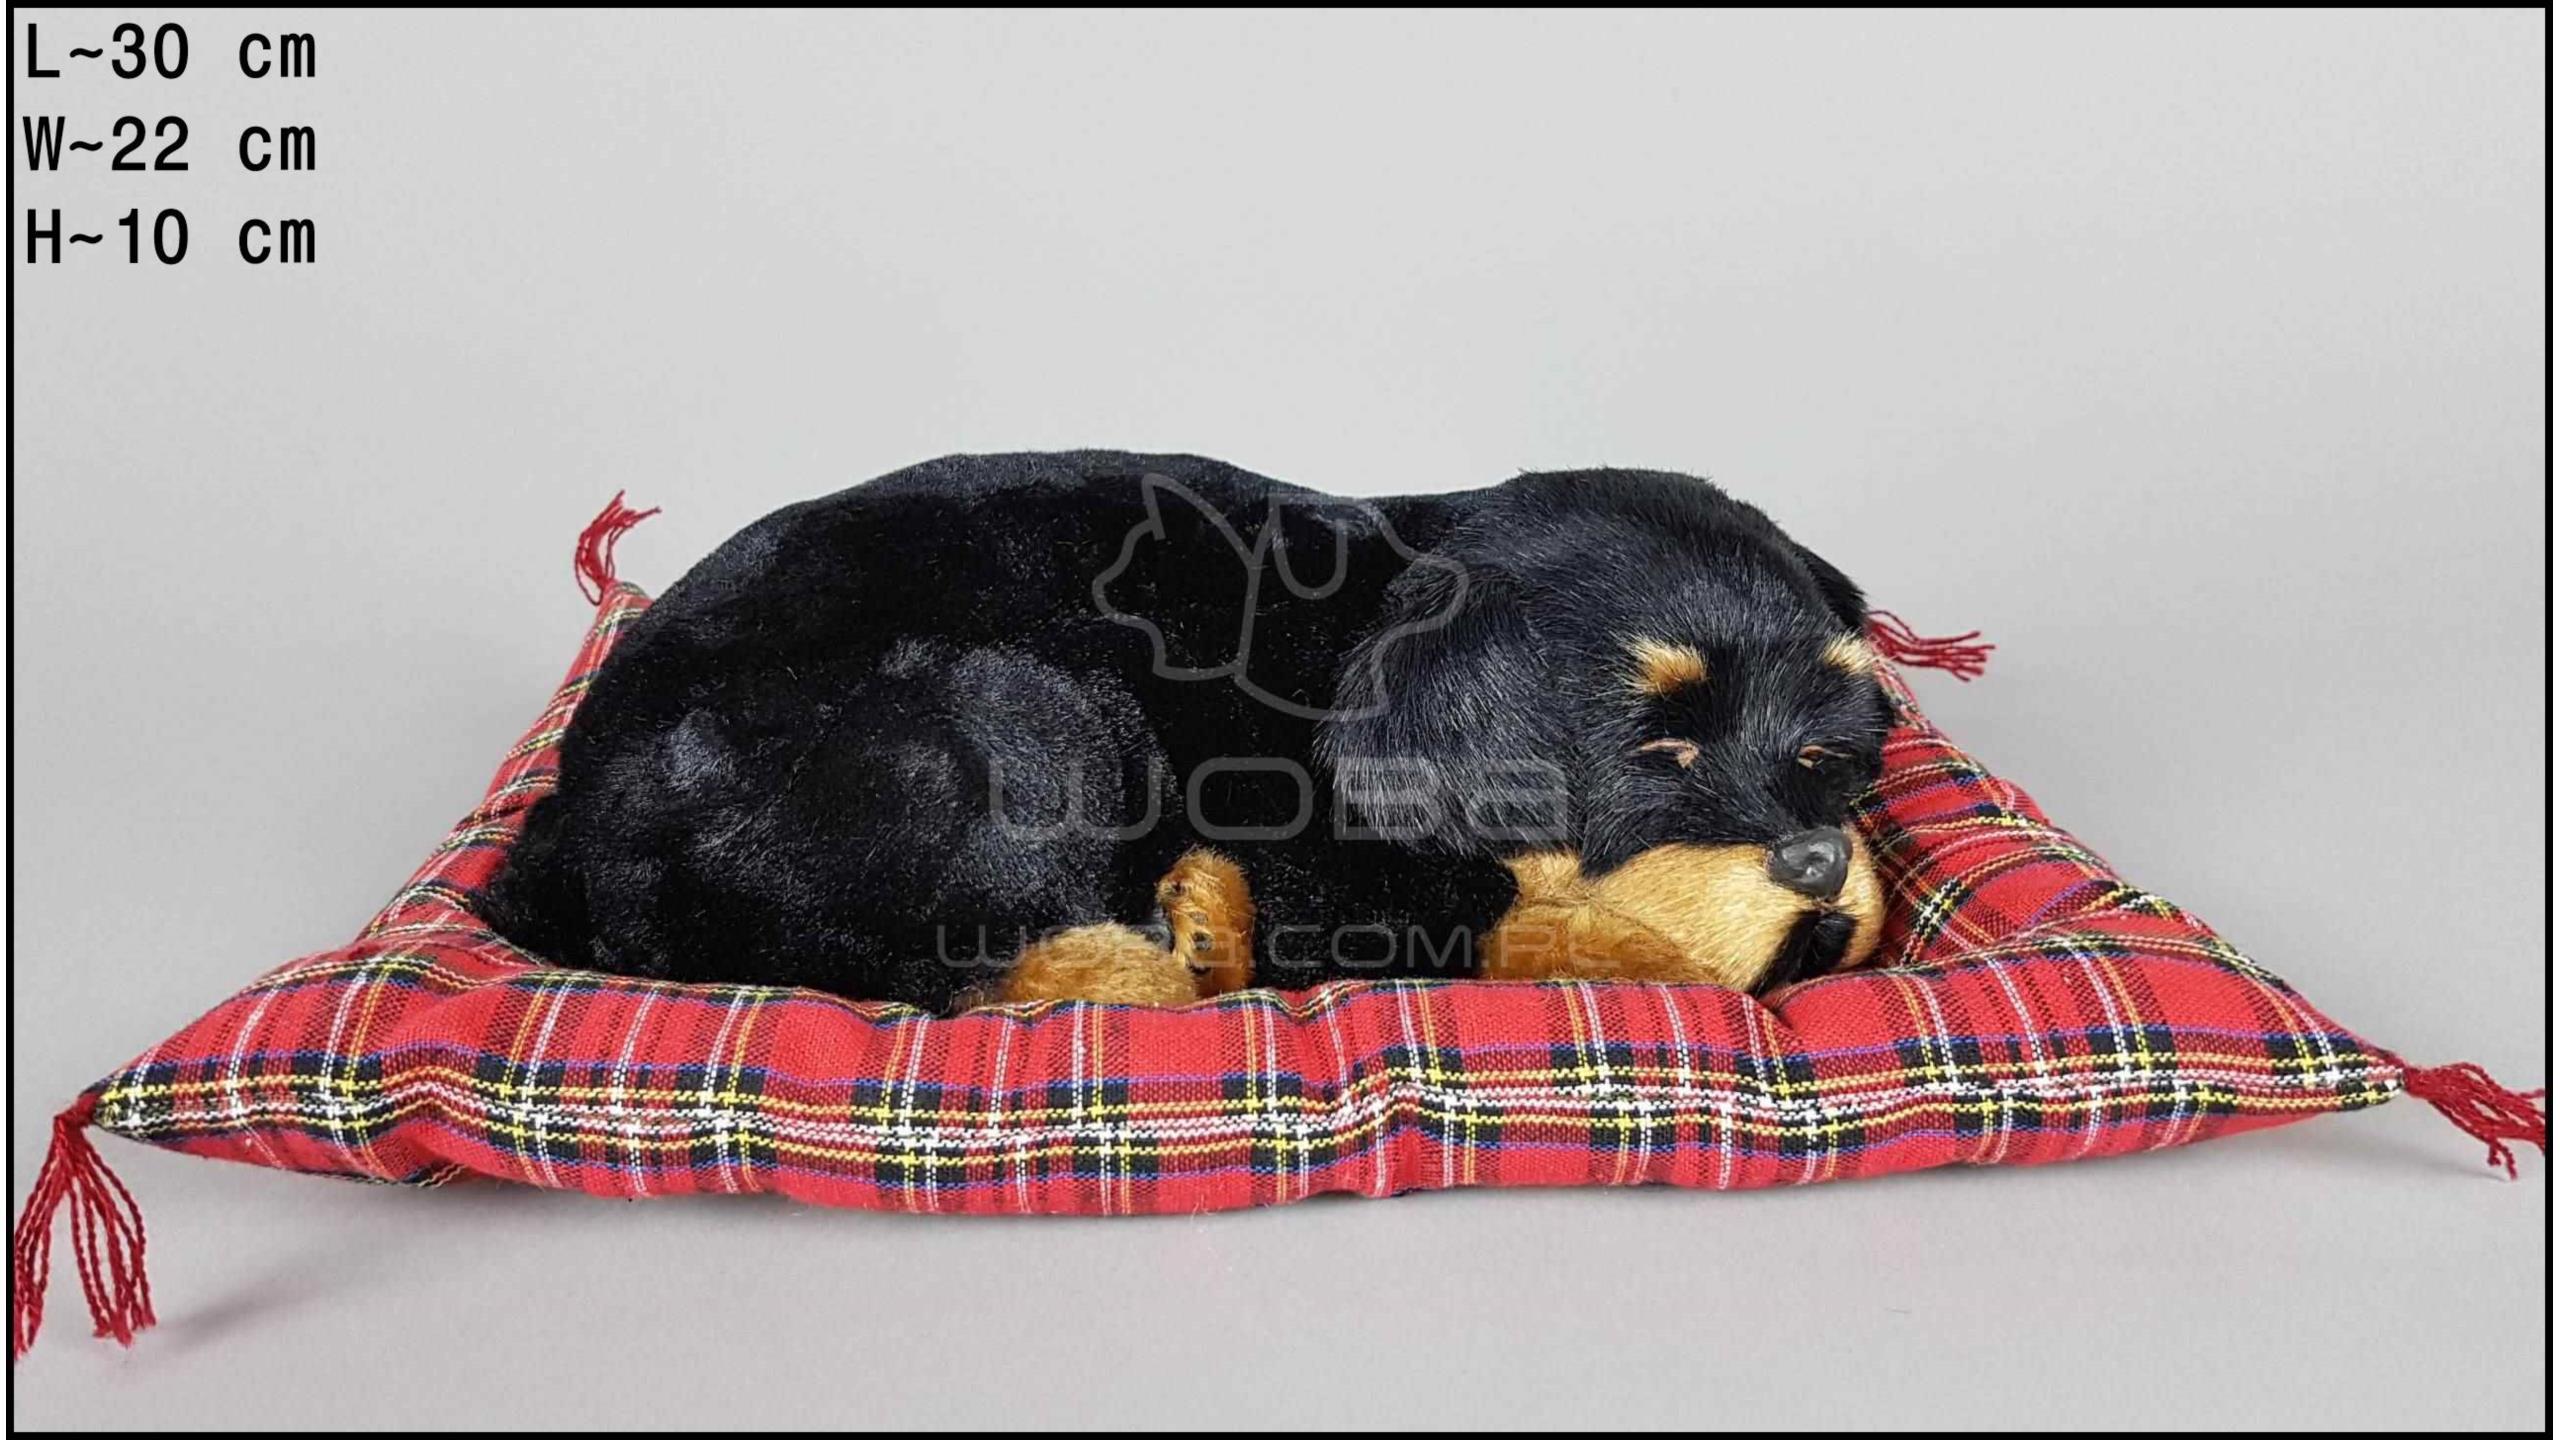 Pies Rottweiler na poduszce Rozmiar L